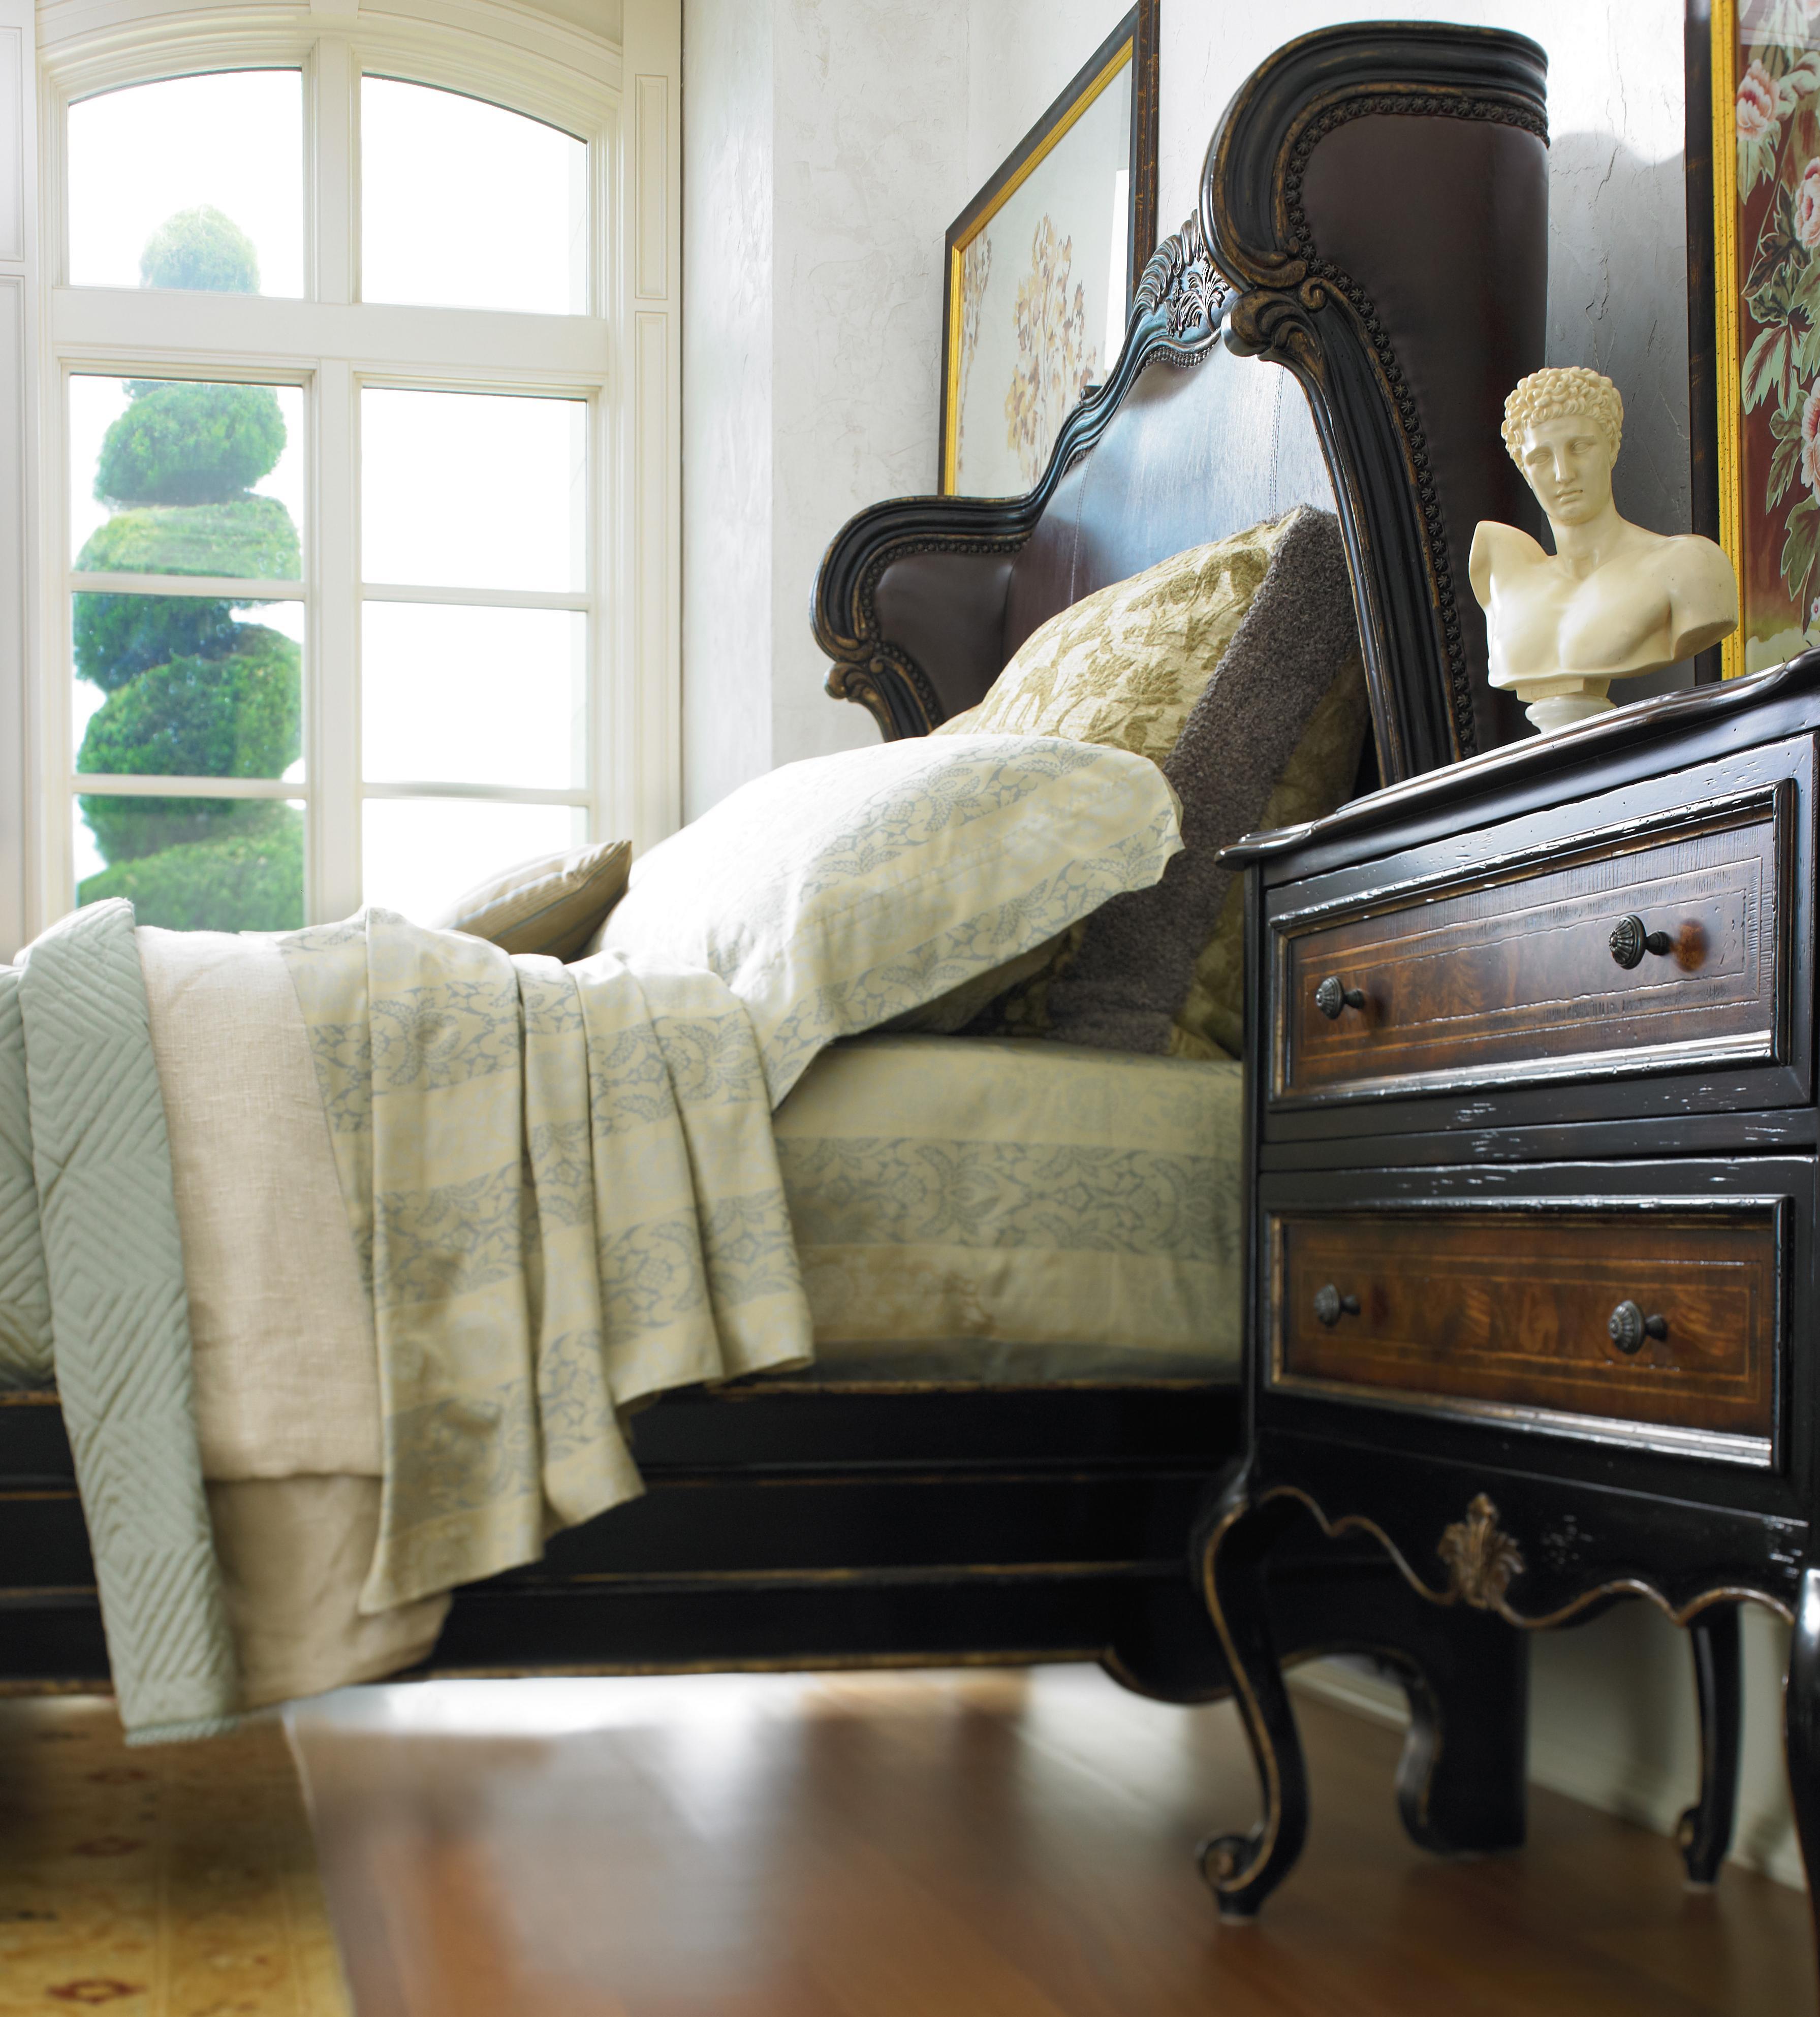 Delightful Hooker Furniture Grandover 2 Drawer Locking Lateral File | Wayside Furniture  | Lateral File